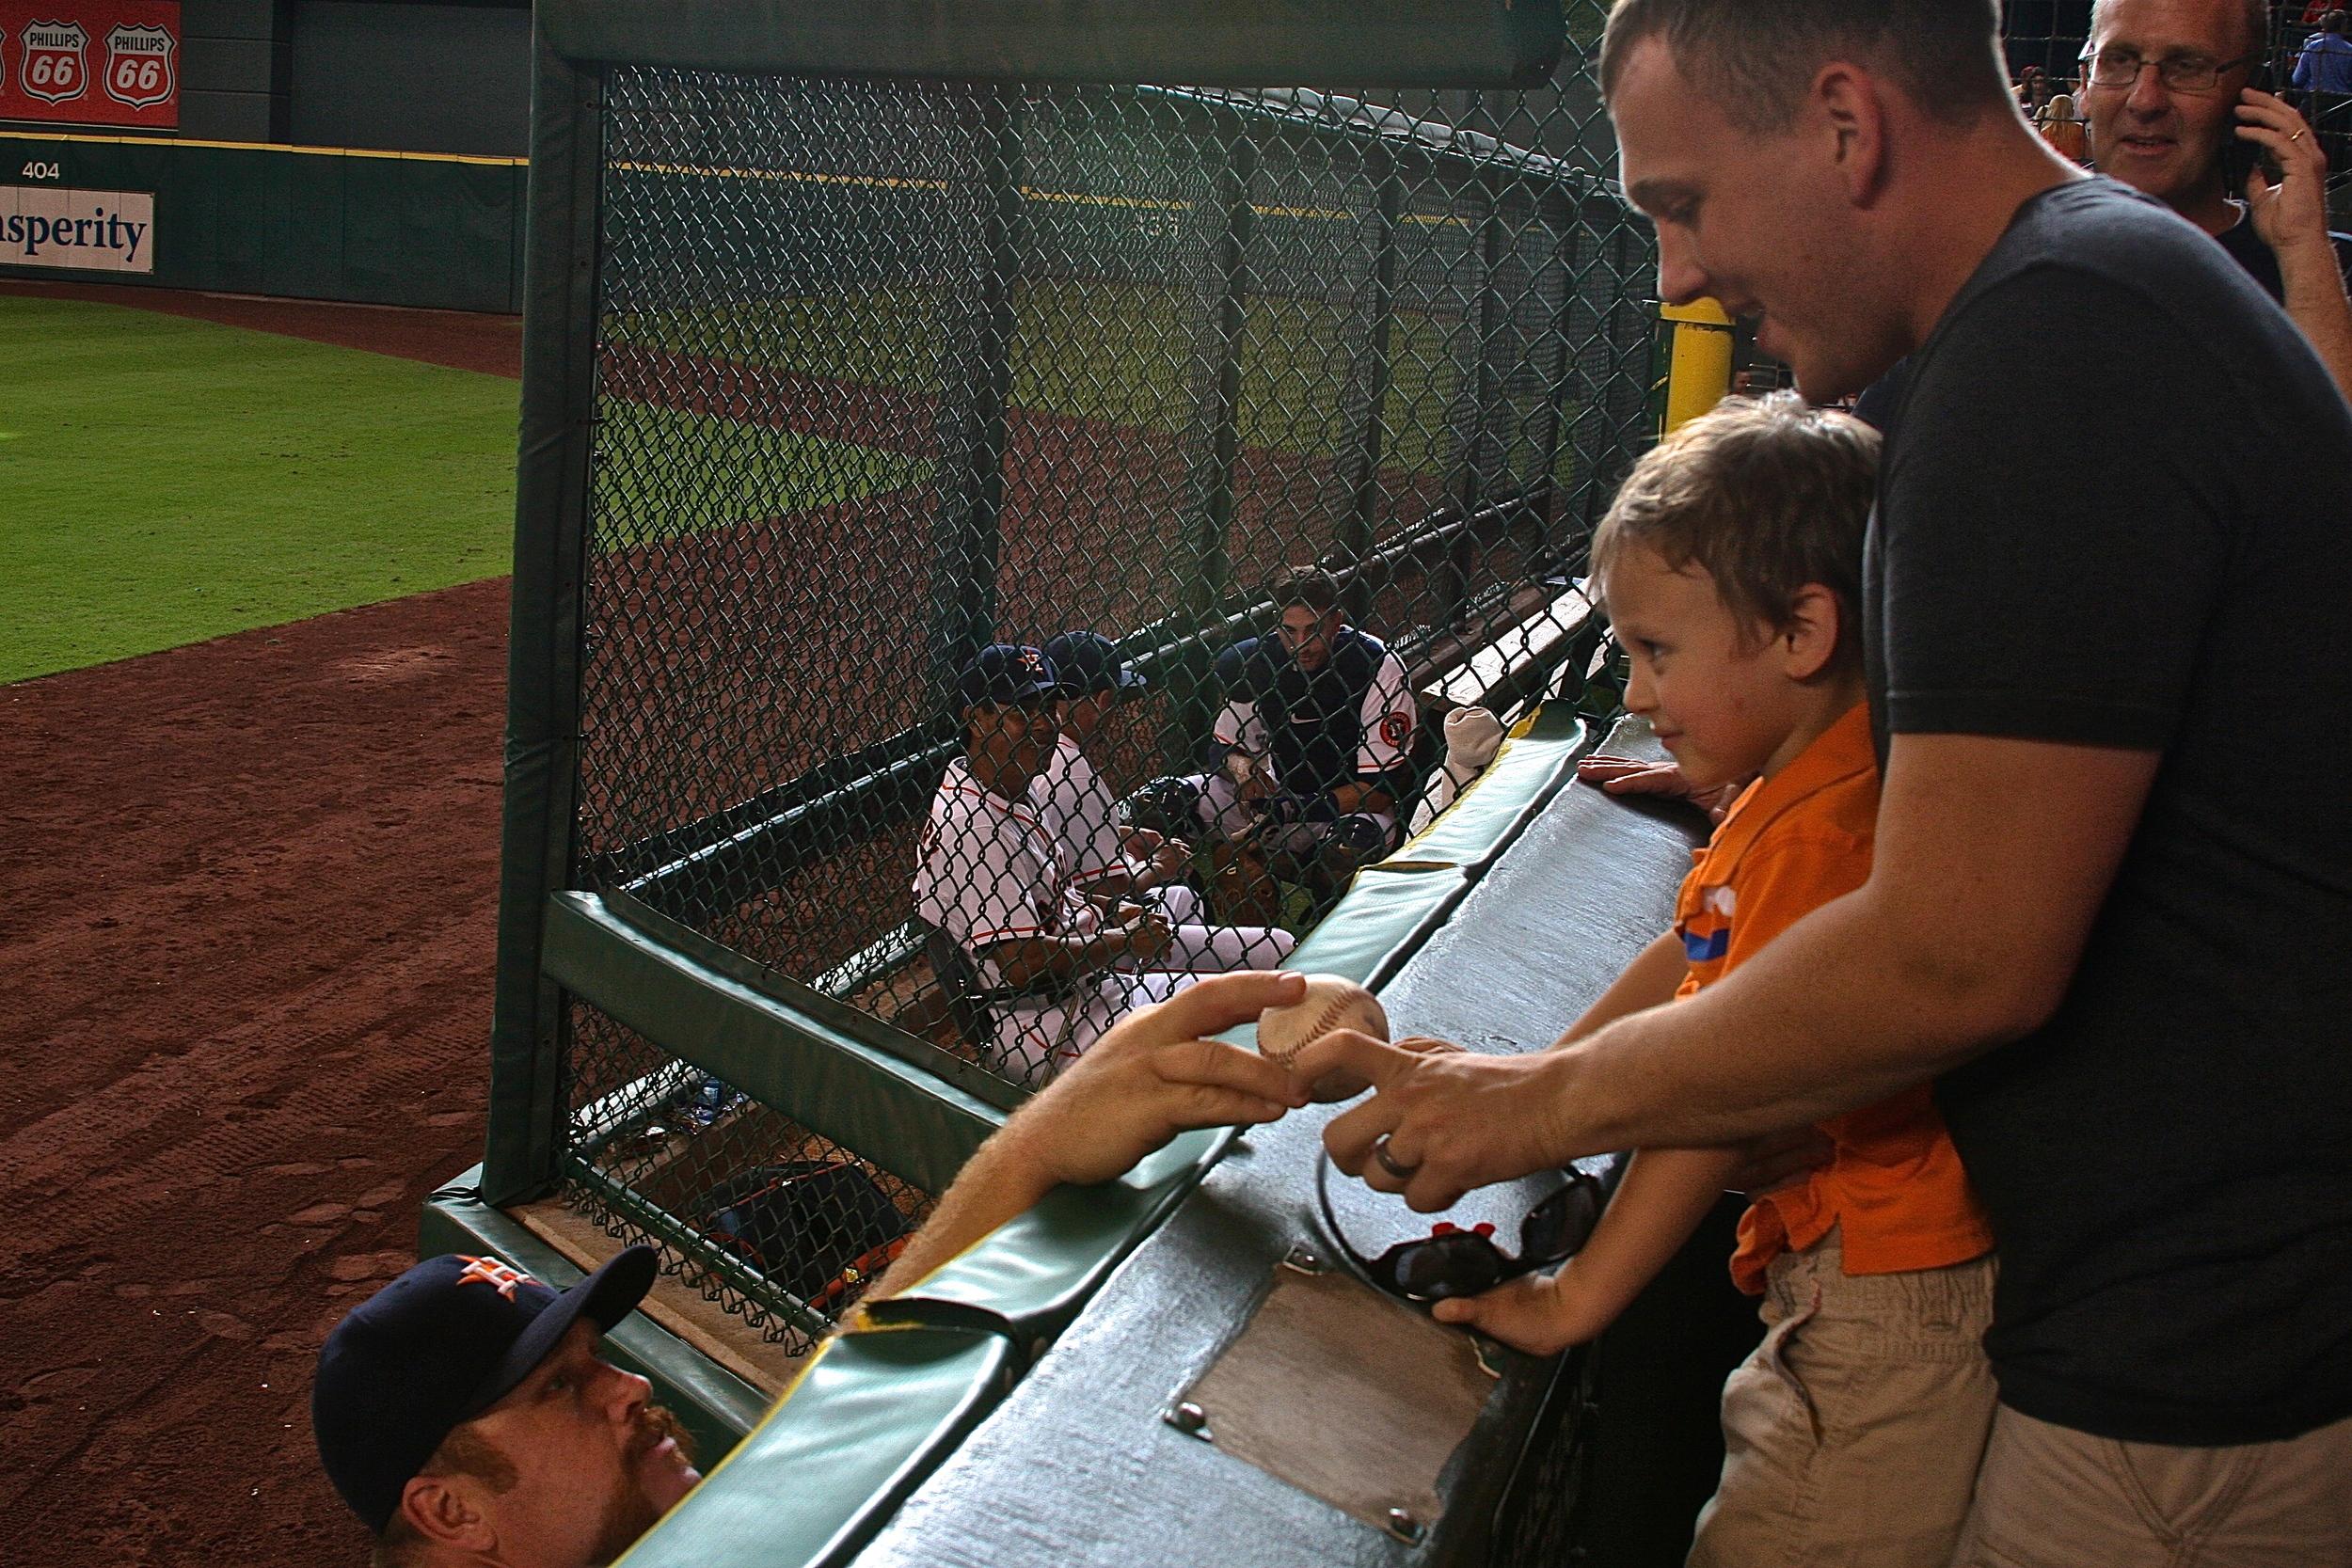 Astros bullpen catcher gives ball to fan